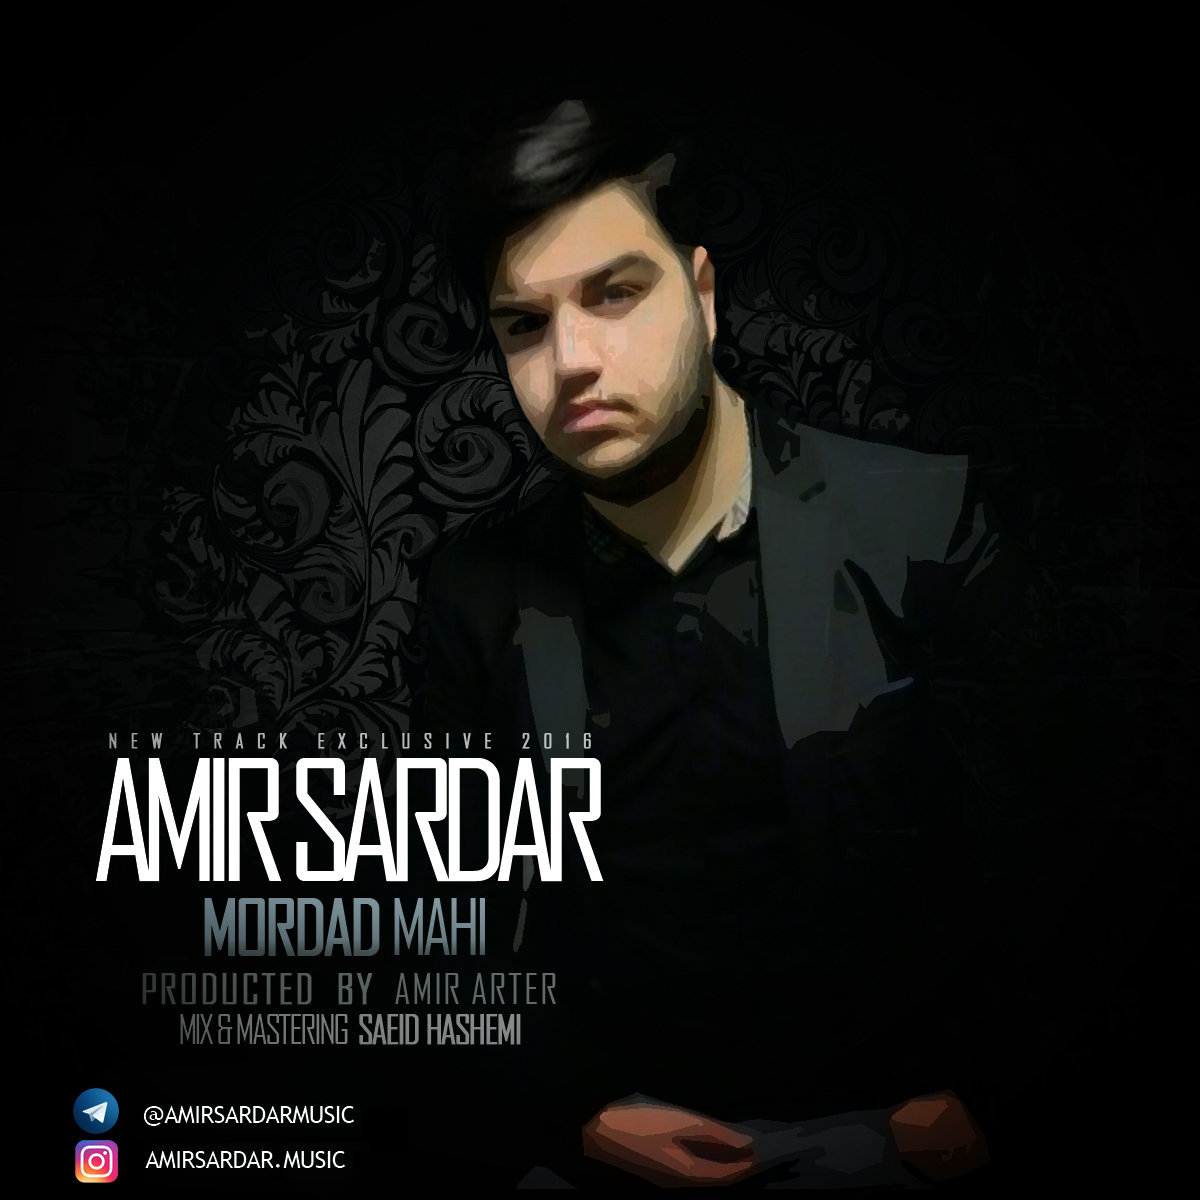 Amir Sardar – Mordad Mahi